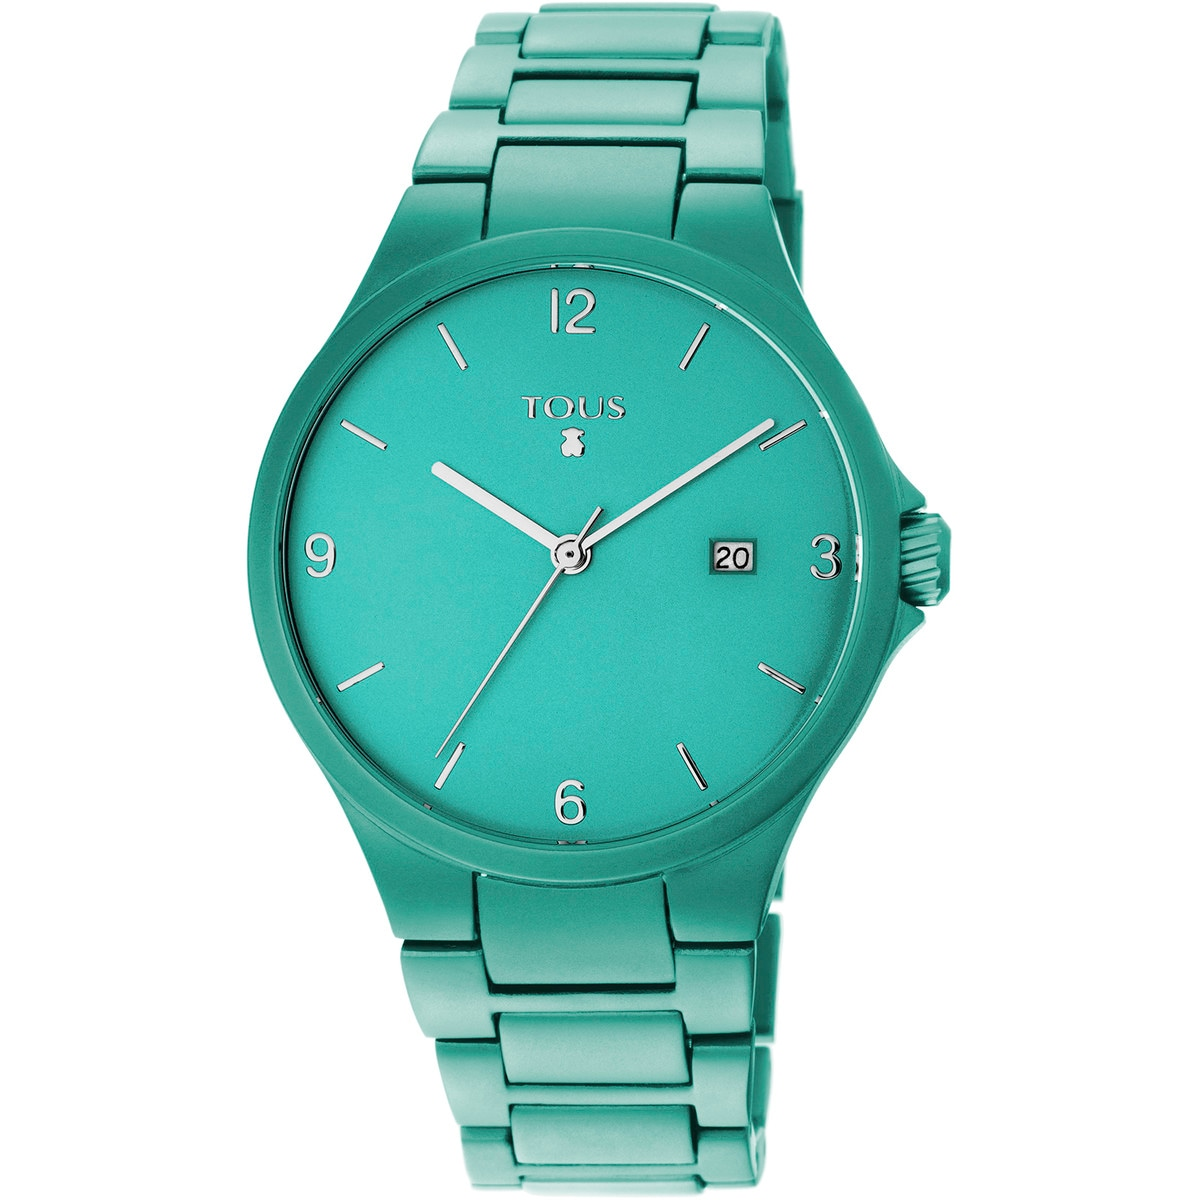 Turquoise anodized aluminum Motion Aluminio Watch